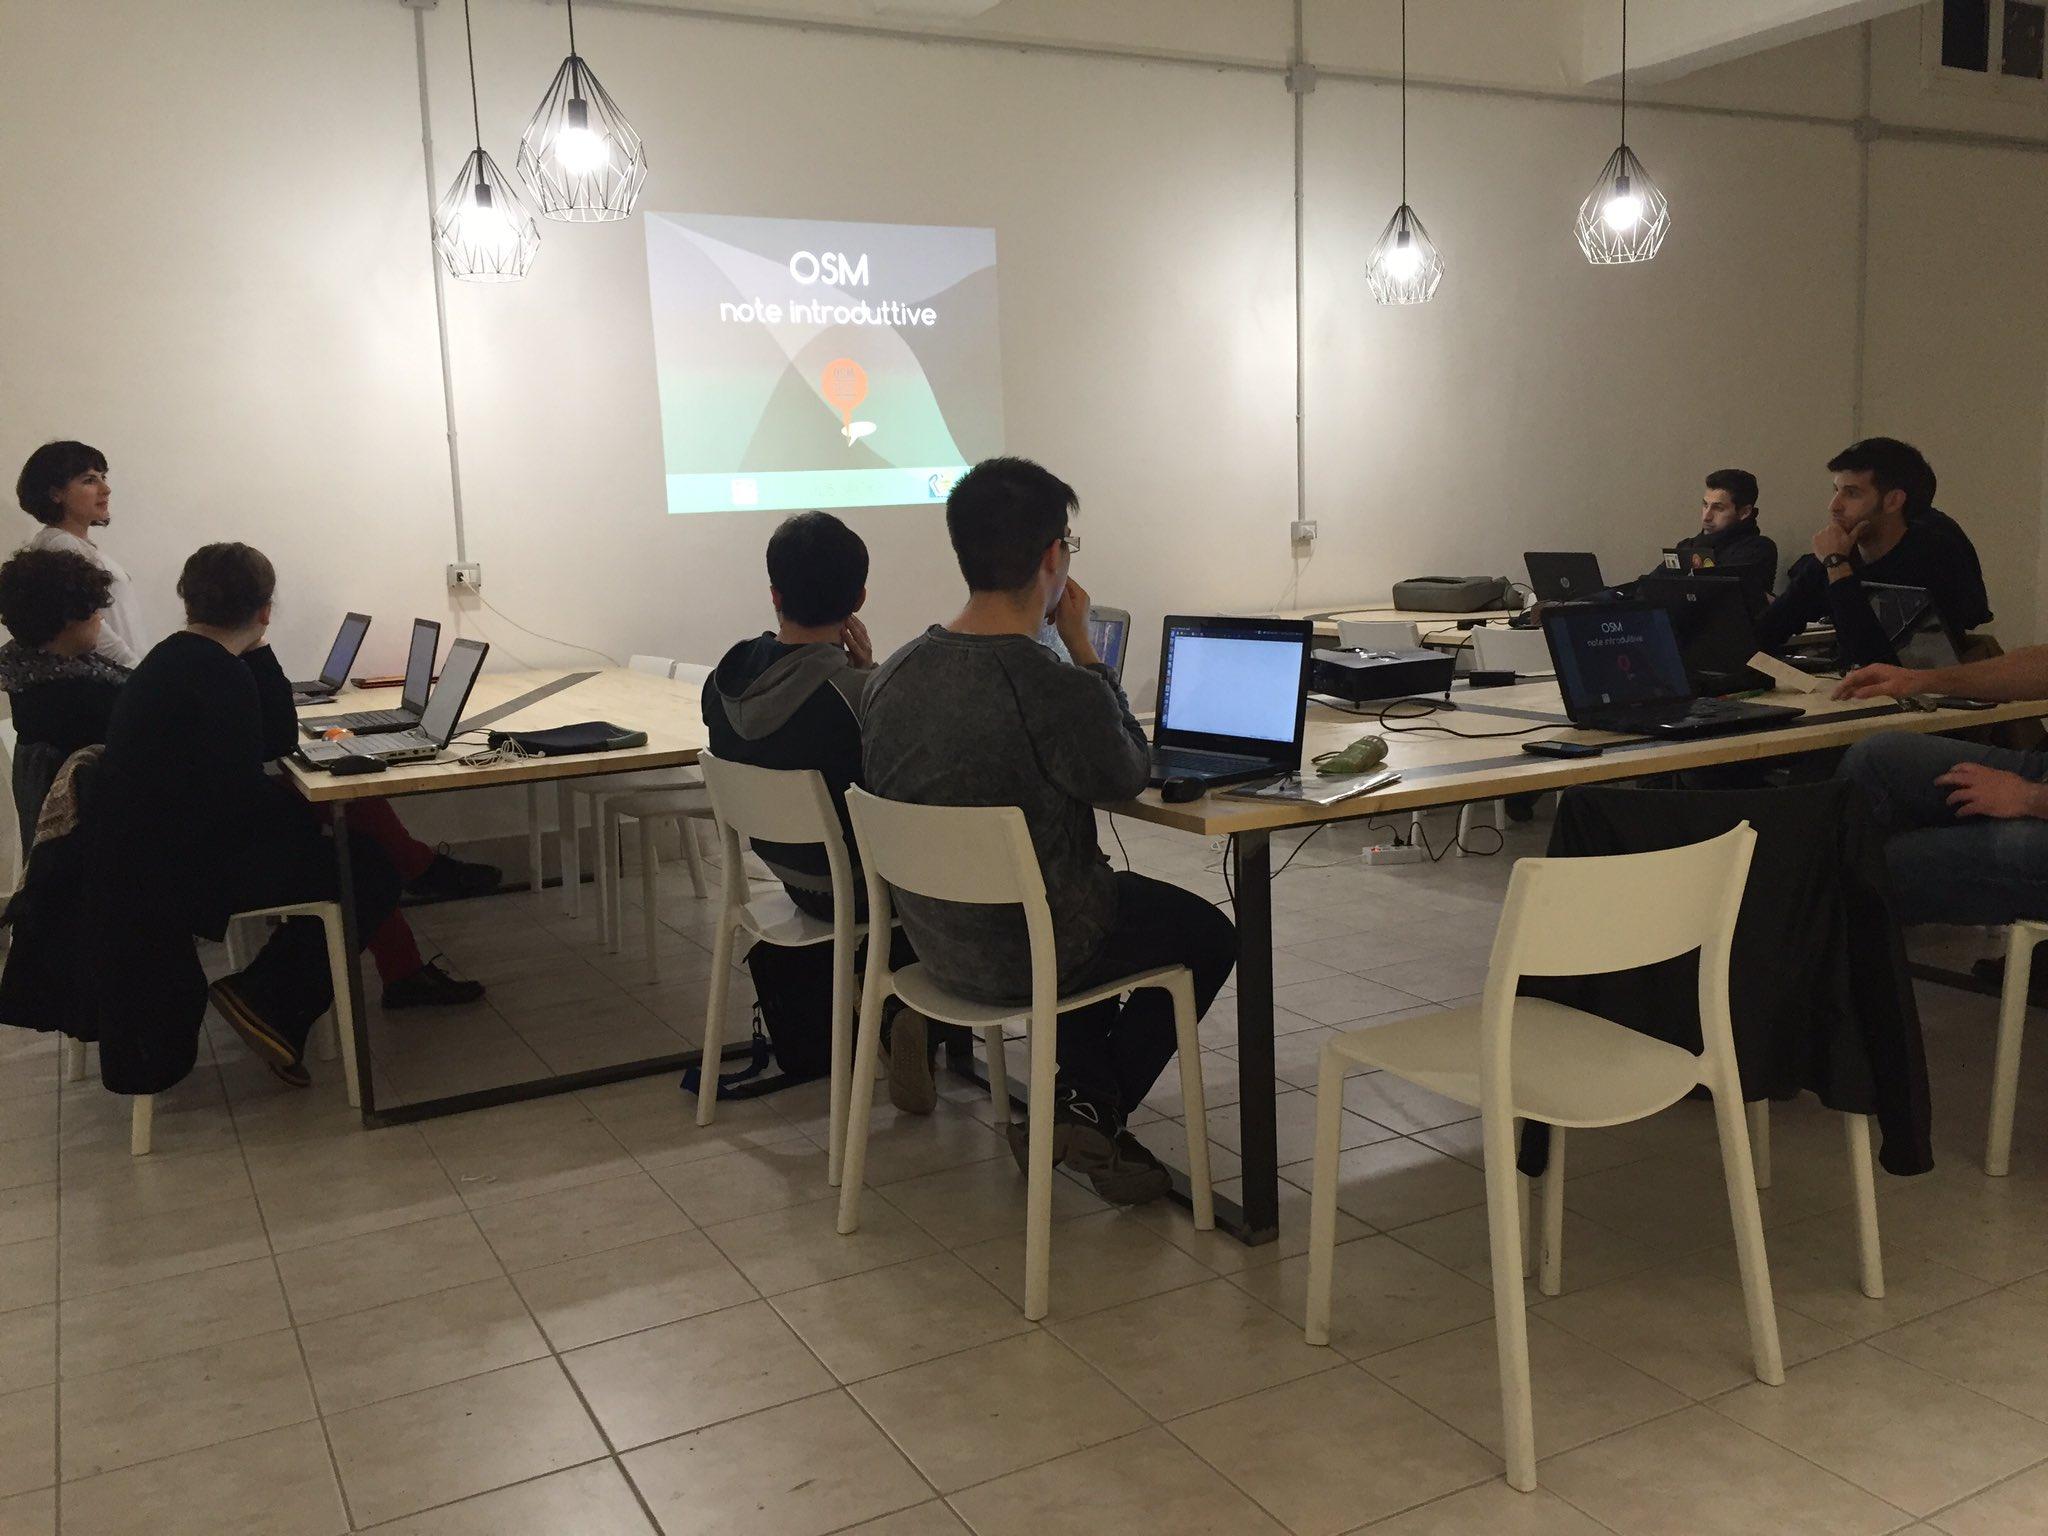 Si parte con il #MappingMeetings per il progetto #5xmillemappe con @Sard_opendata sardinia. #opendata #events #osm https://t.co/UFSp9FYVhk